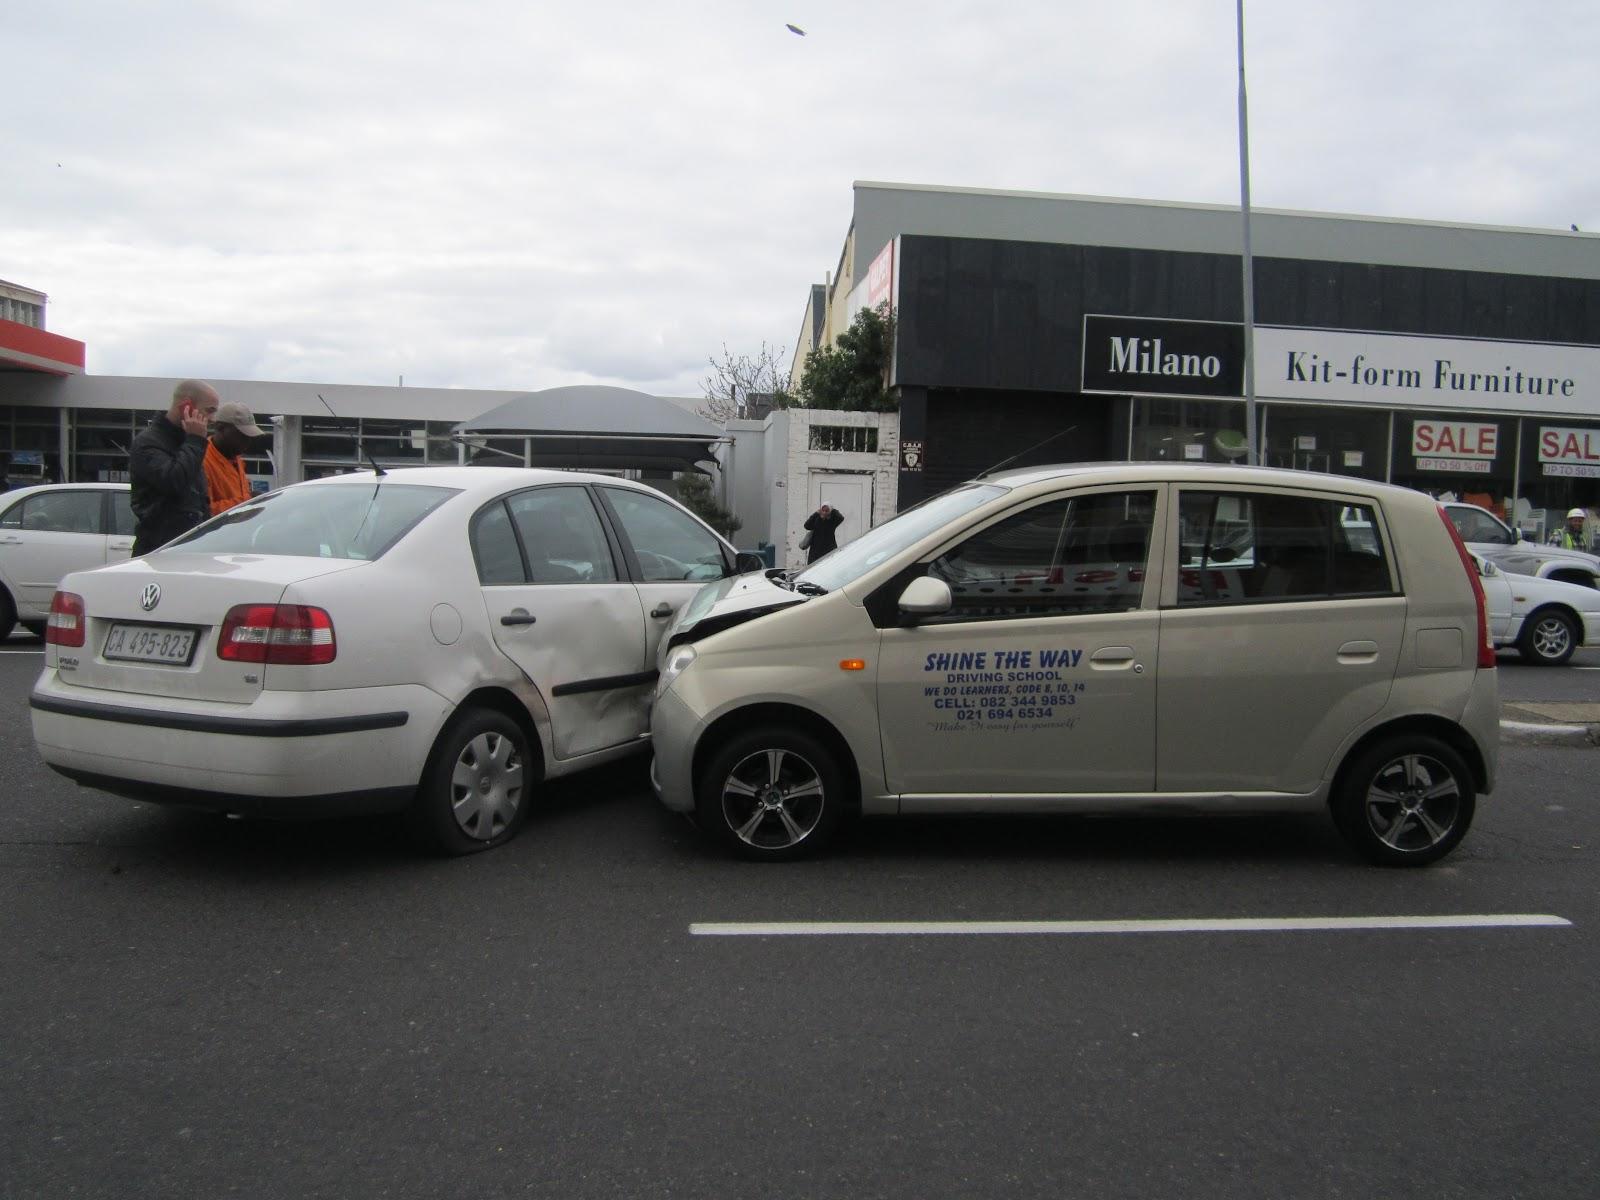 Bush Radio 89 5 fm Newsroom: Minor accident occurs in